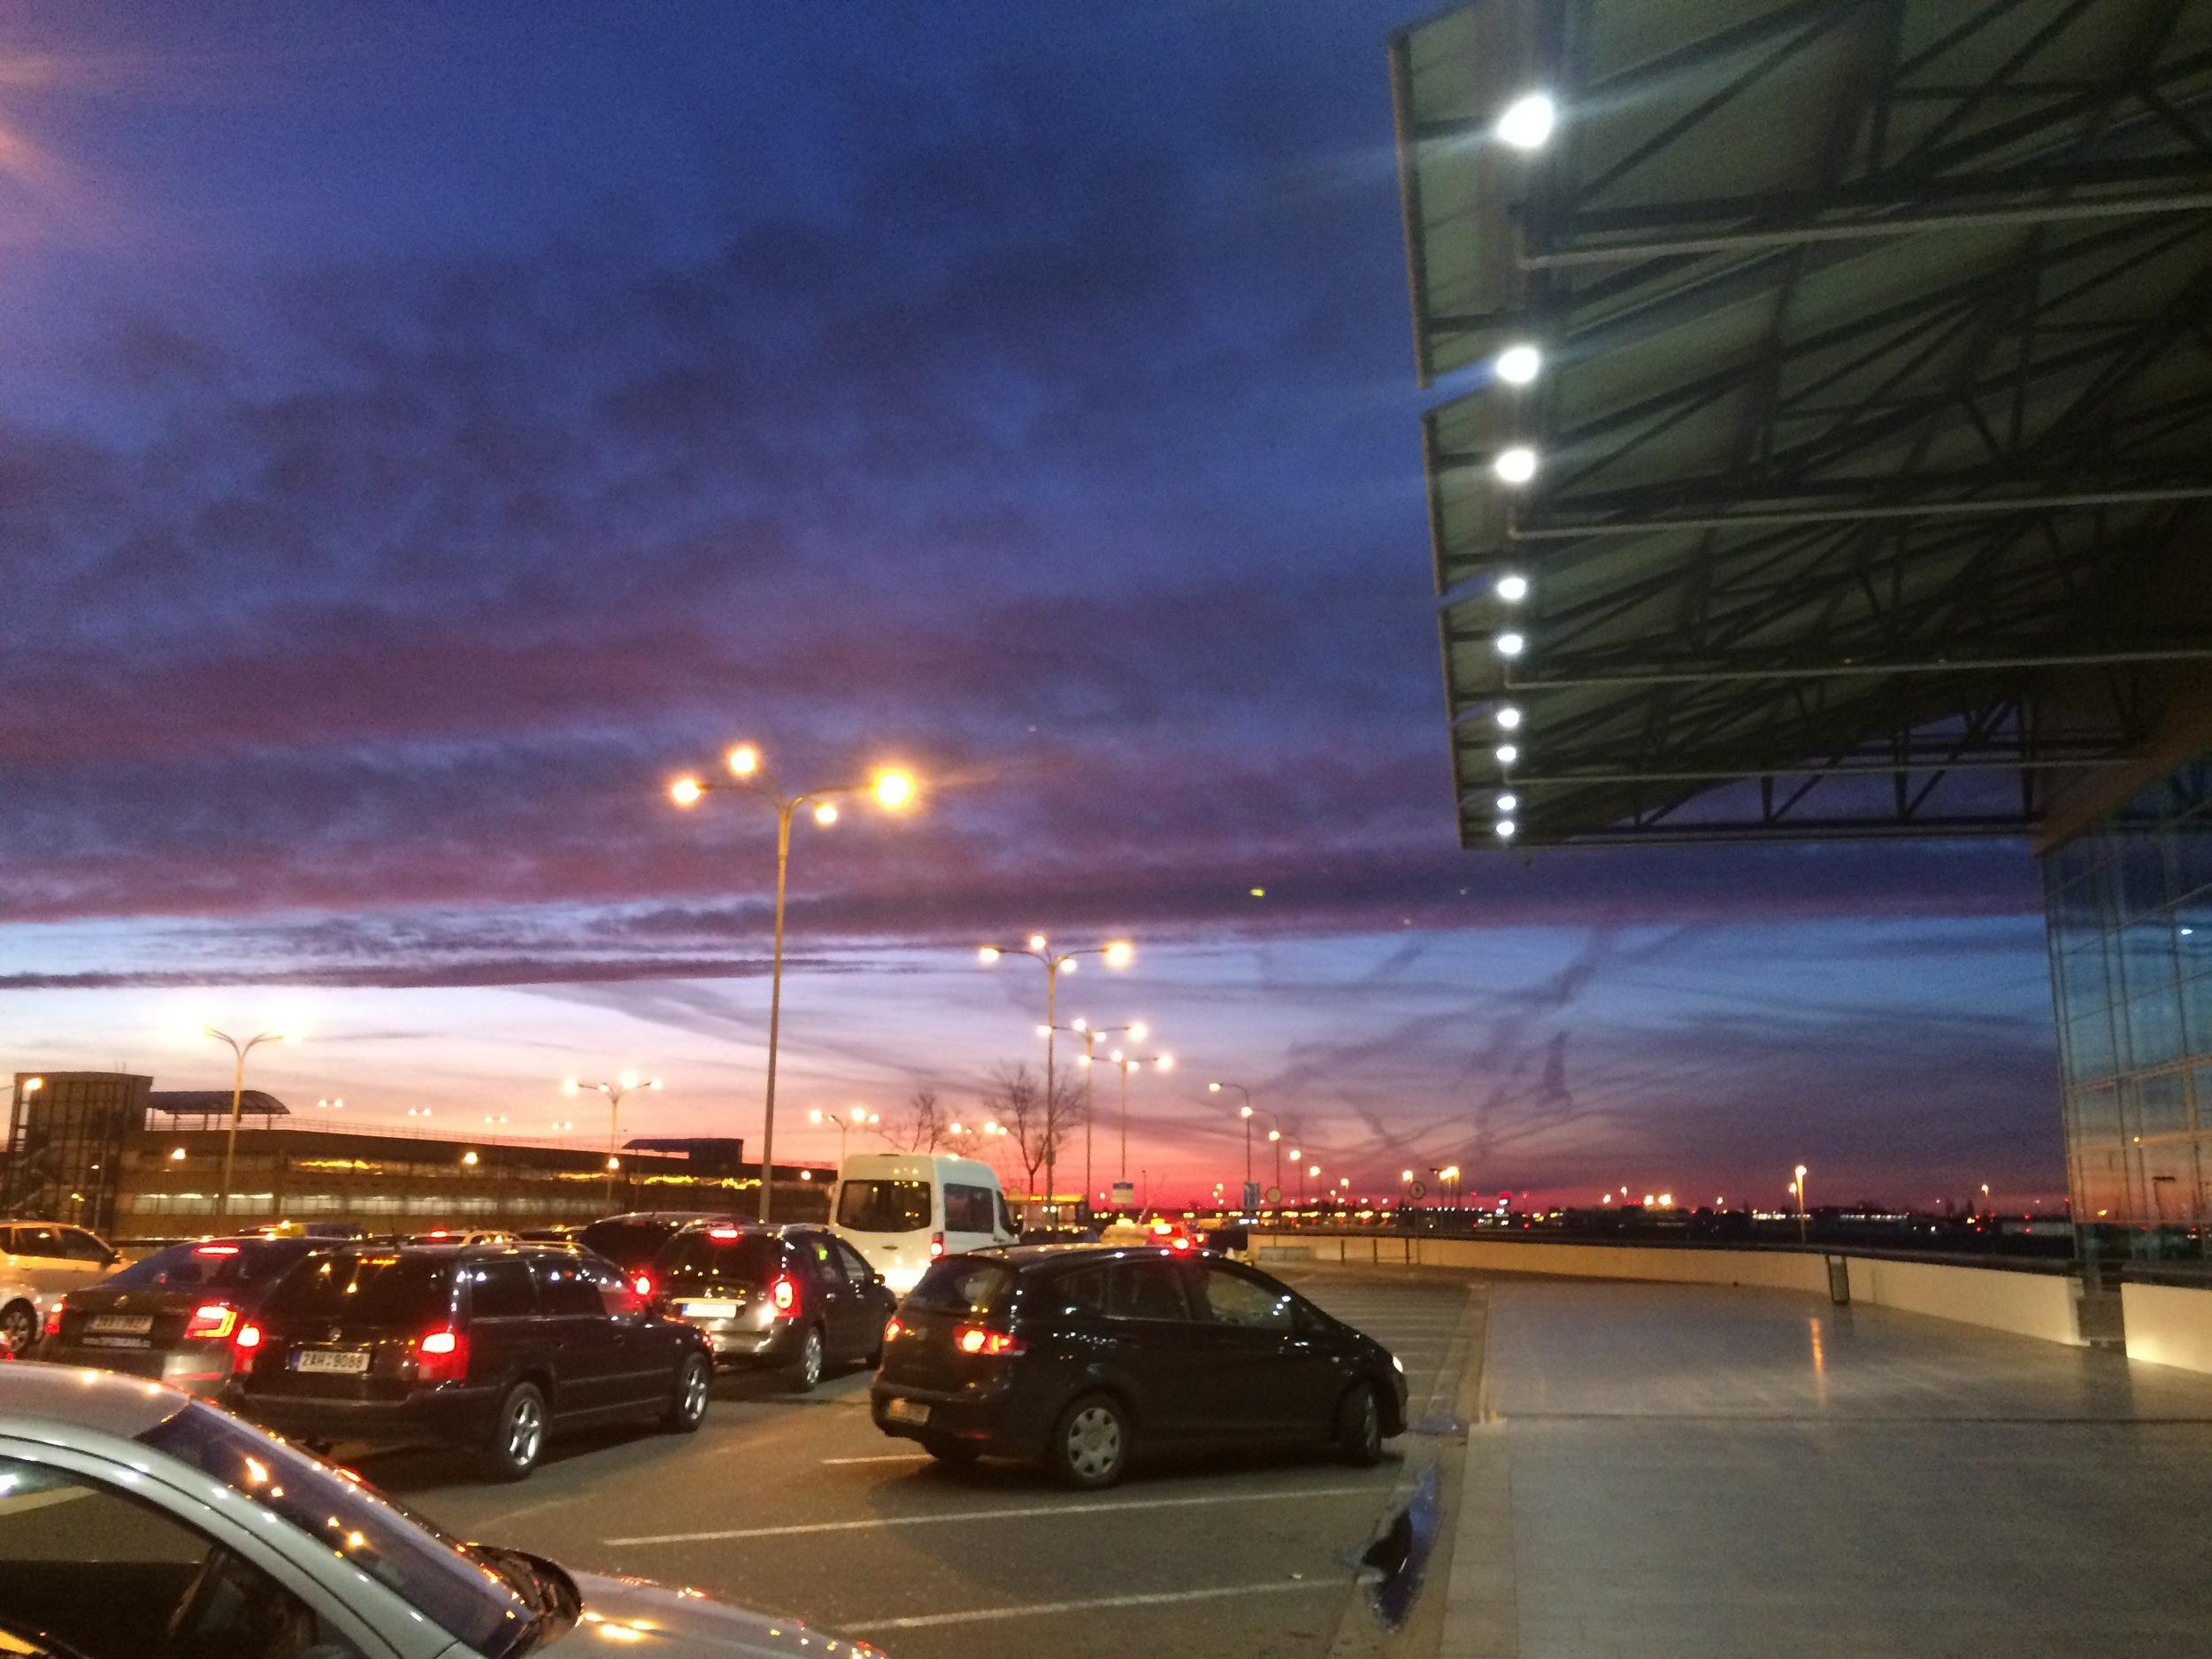 Sunrise at thePrague airport